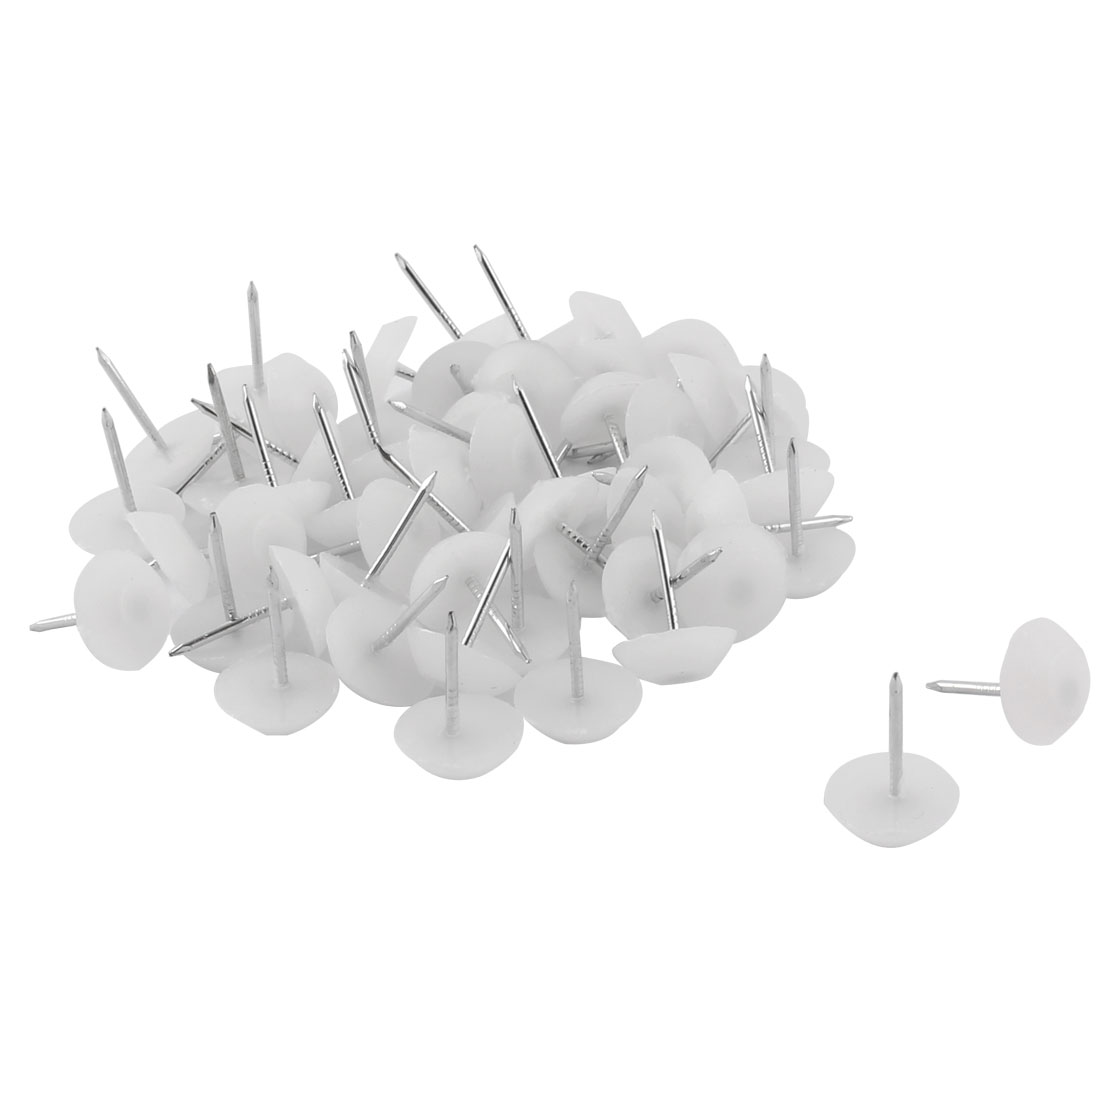 Furniture Chair Plastic Leg Feet Protector Non-slip Nails White 1.2cm Dia 50pcs